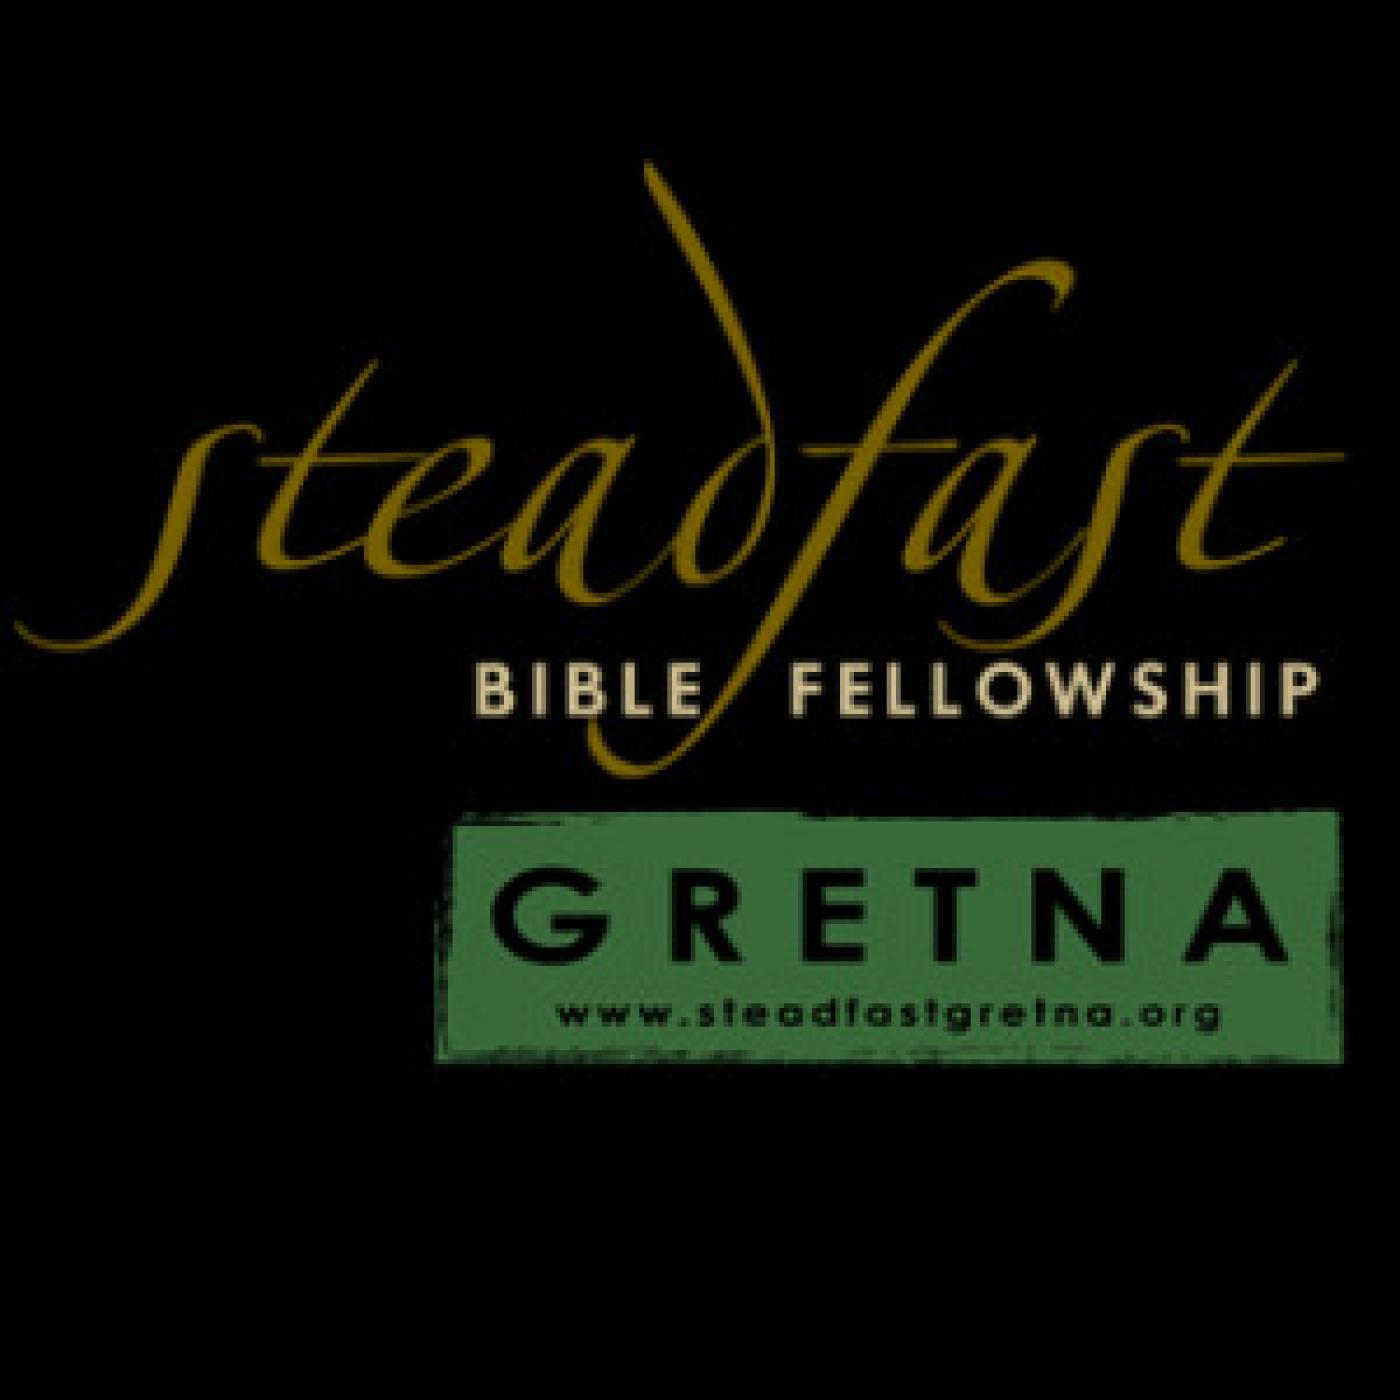 Steadfast Gretna